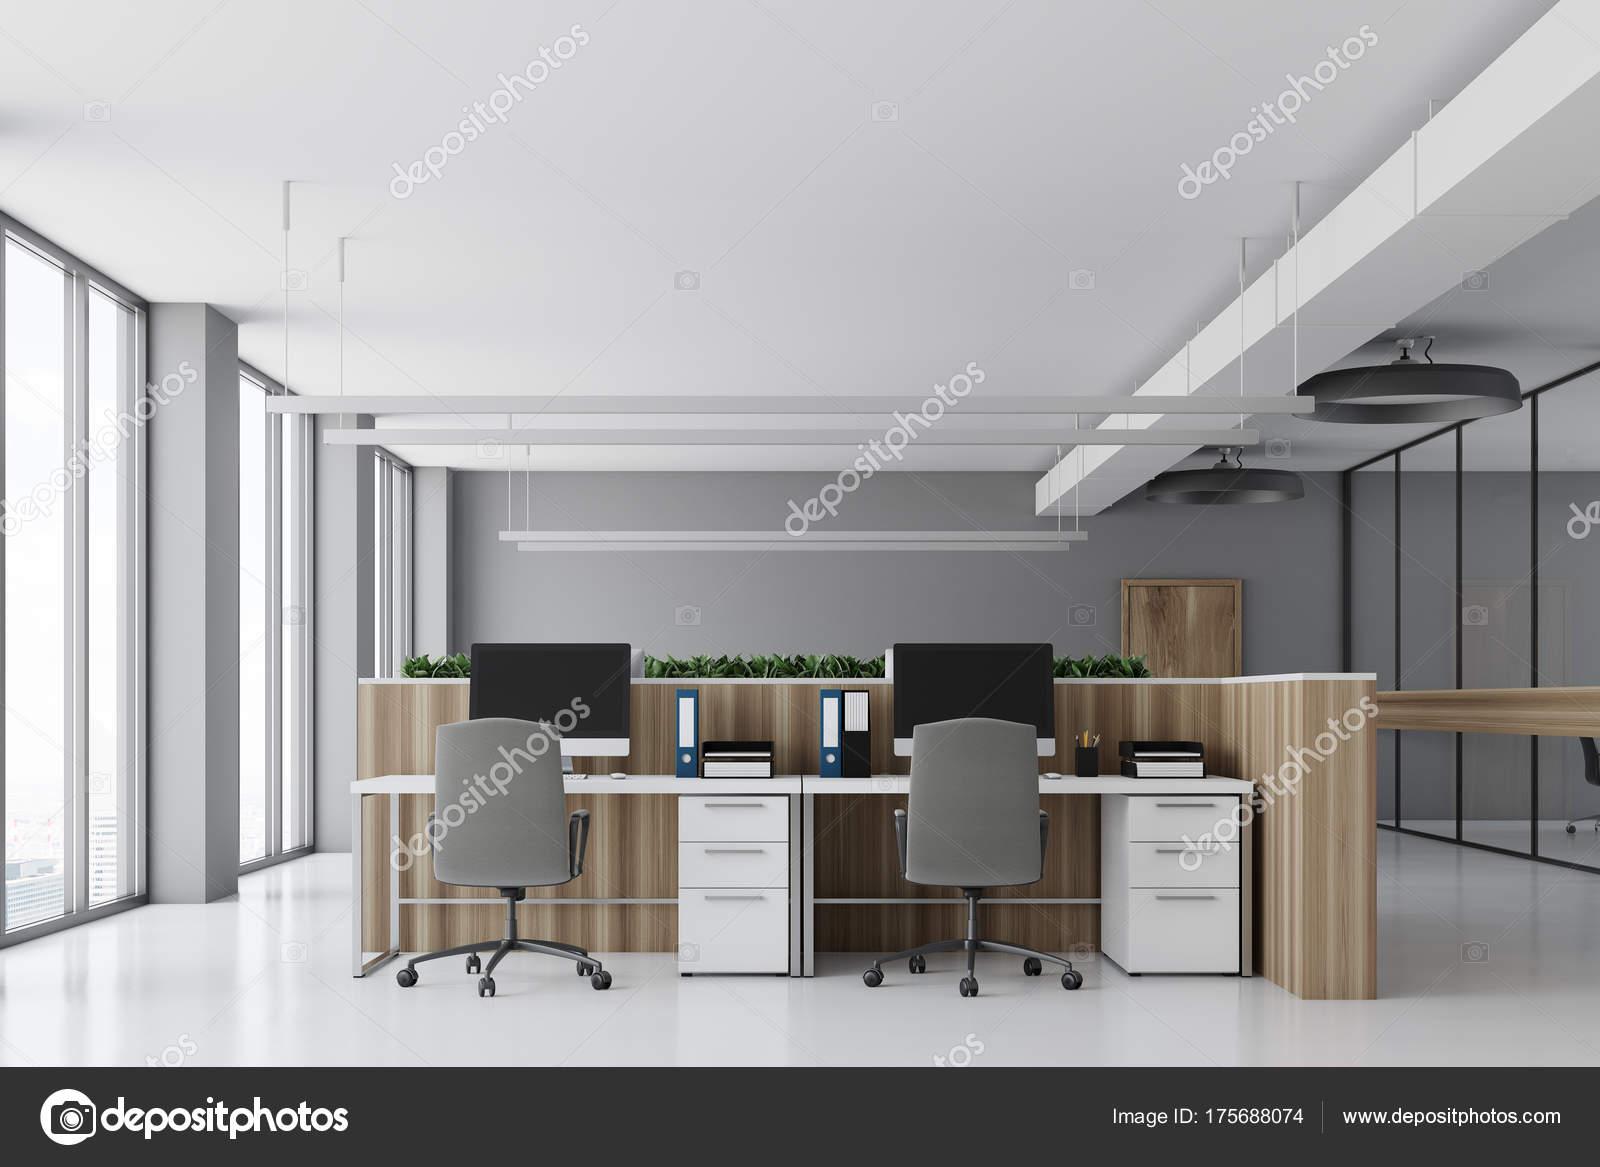 https://st3.depositphotos.com/2673929/17568/i/1600/depositphotos_175688074-stock-photo-white-office-wooden-desks-concrete.jpg